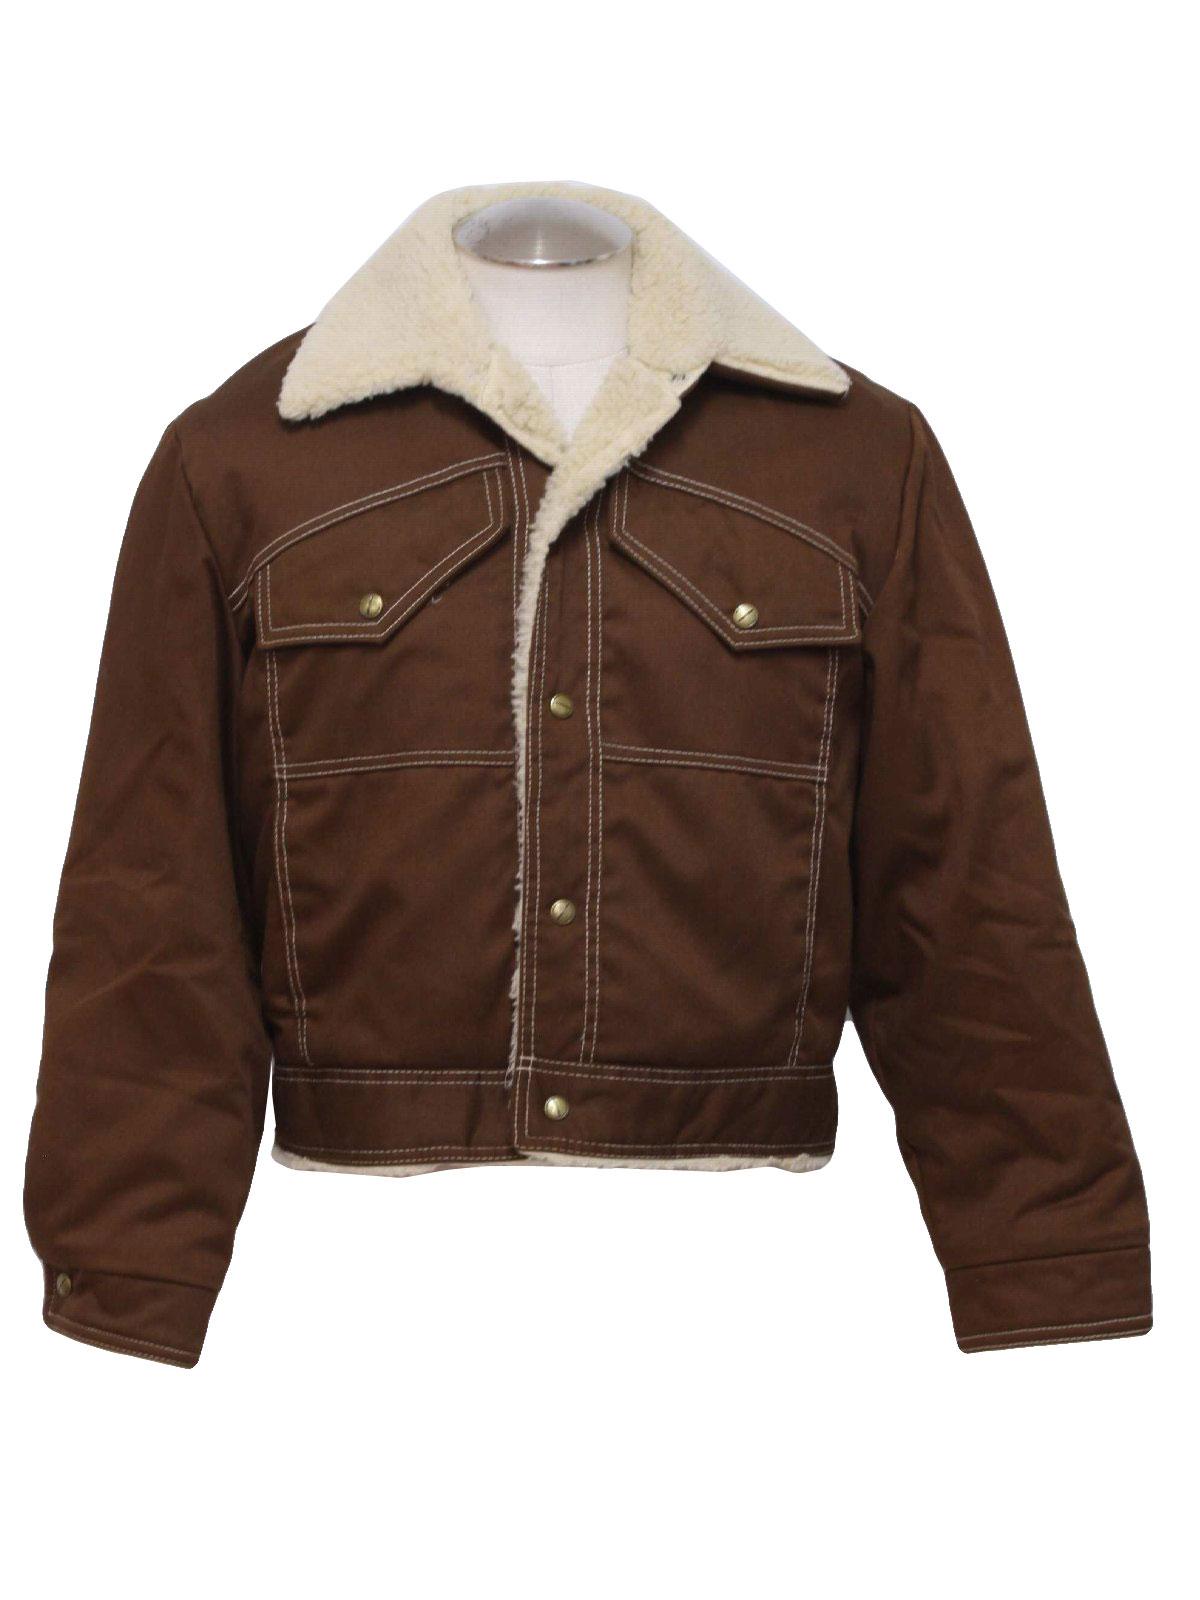 Vintage 1970&39s Jacket: 70s -J C Penney- Mens brown cotton